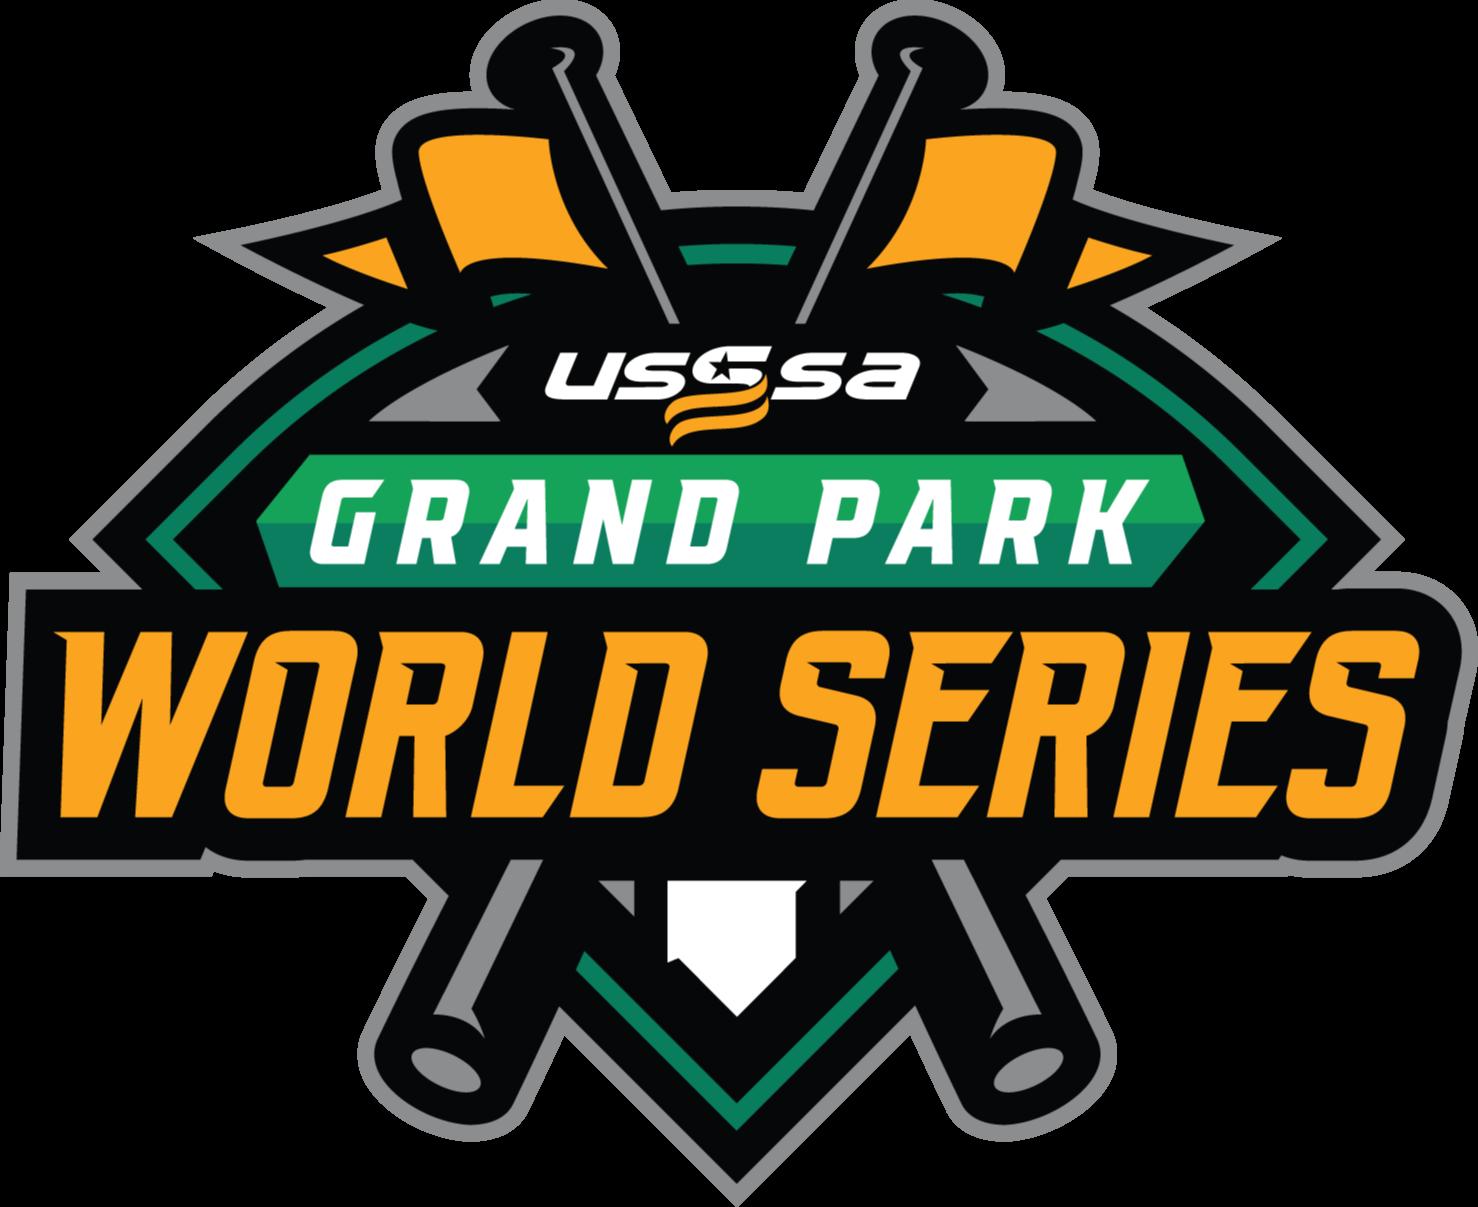 USSSA Grand Park World Series